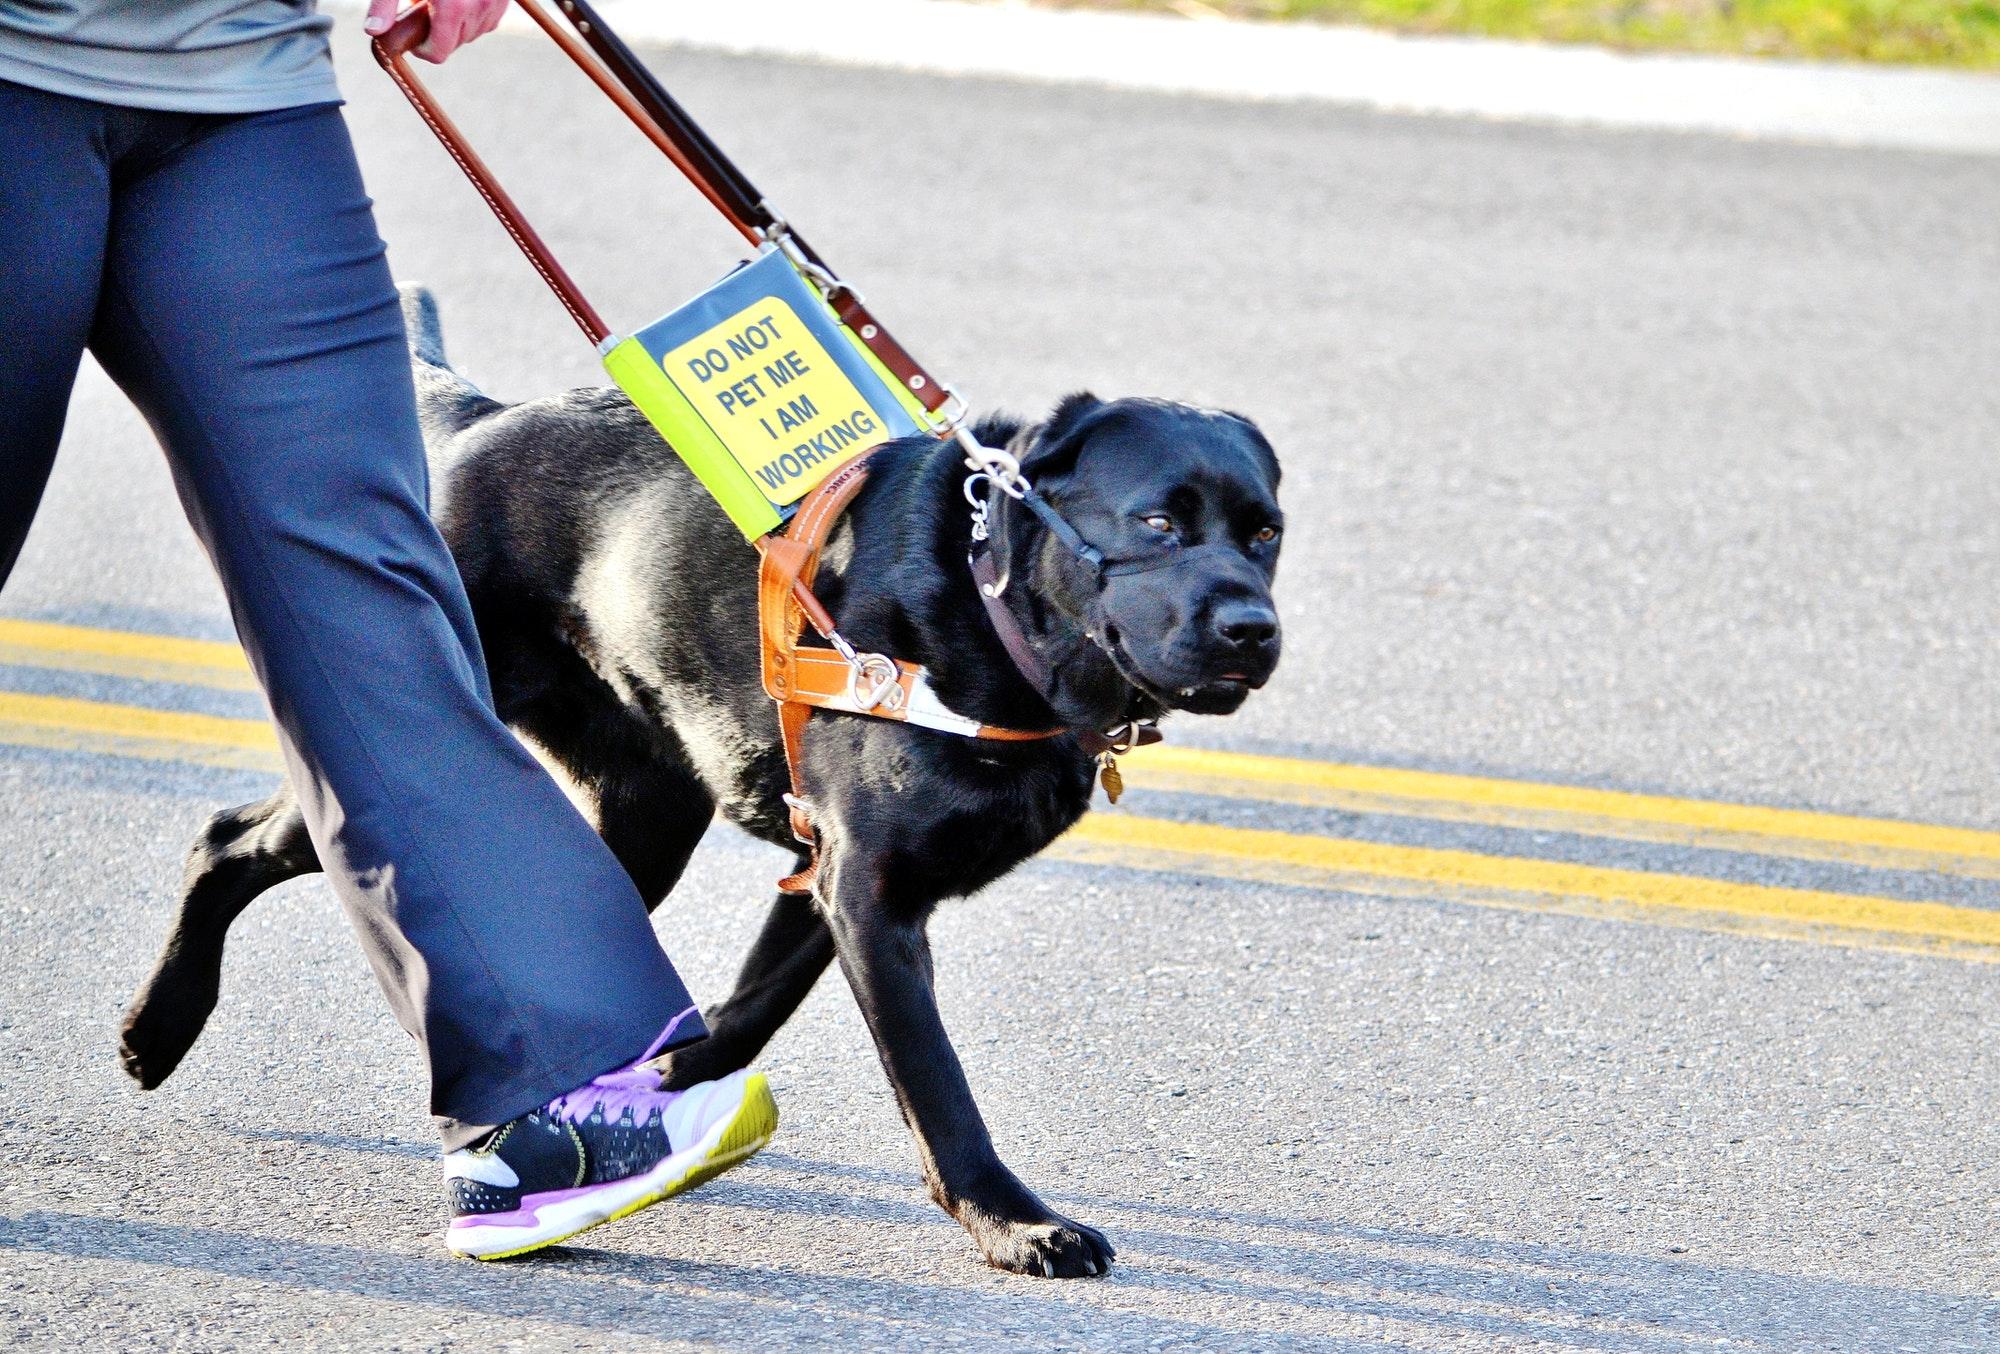 Service dog in a 5k!